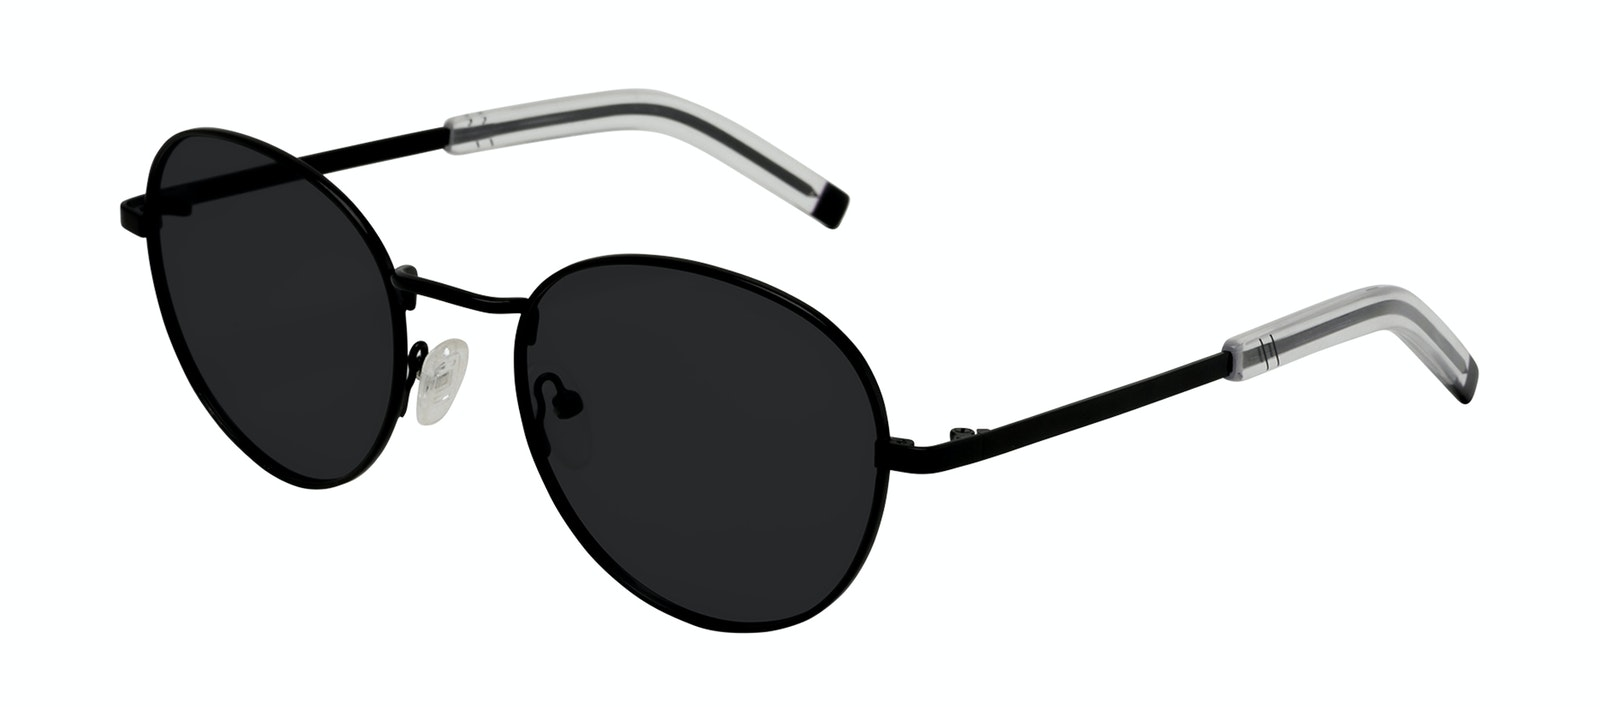 Affordable Fashion Glasses Round Sunglasses Men Lean XL Black Tilt